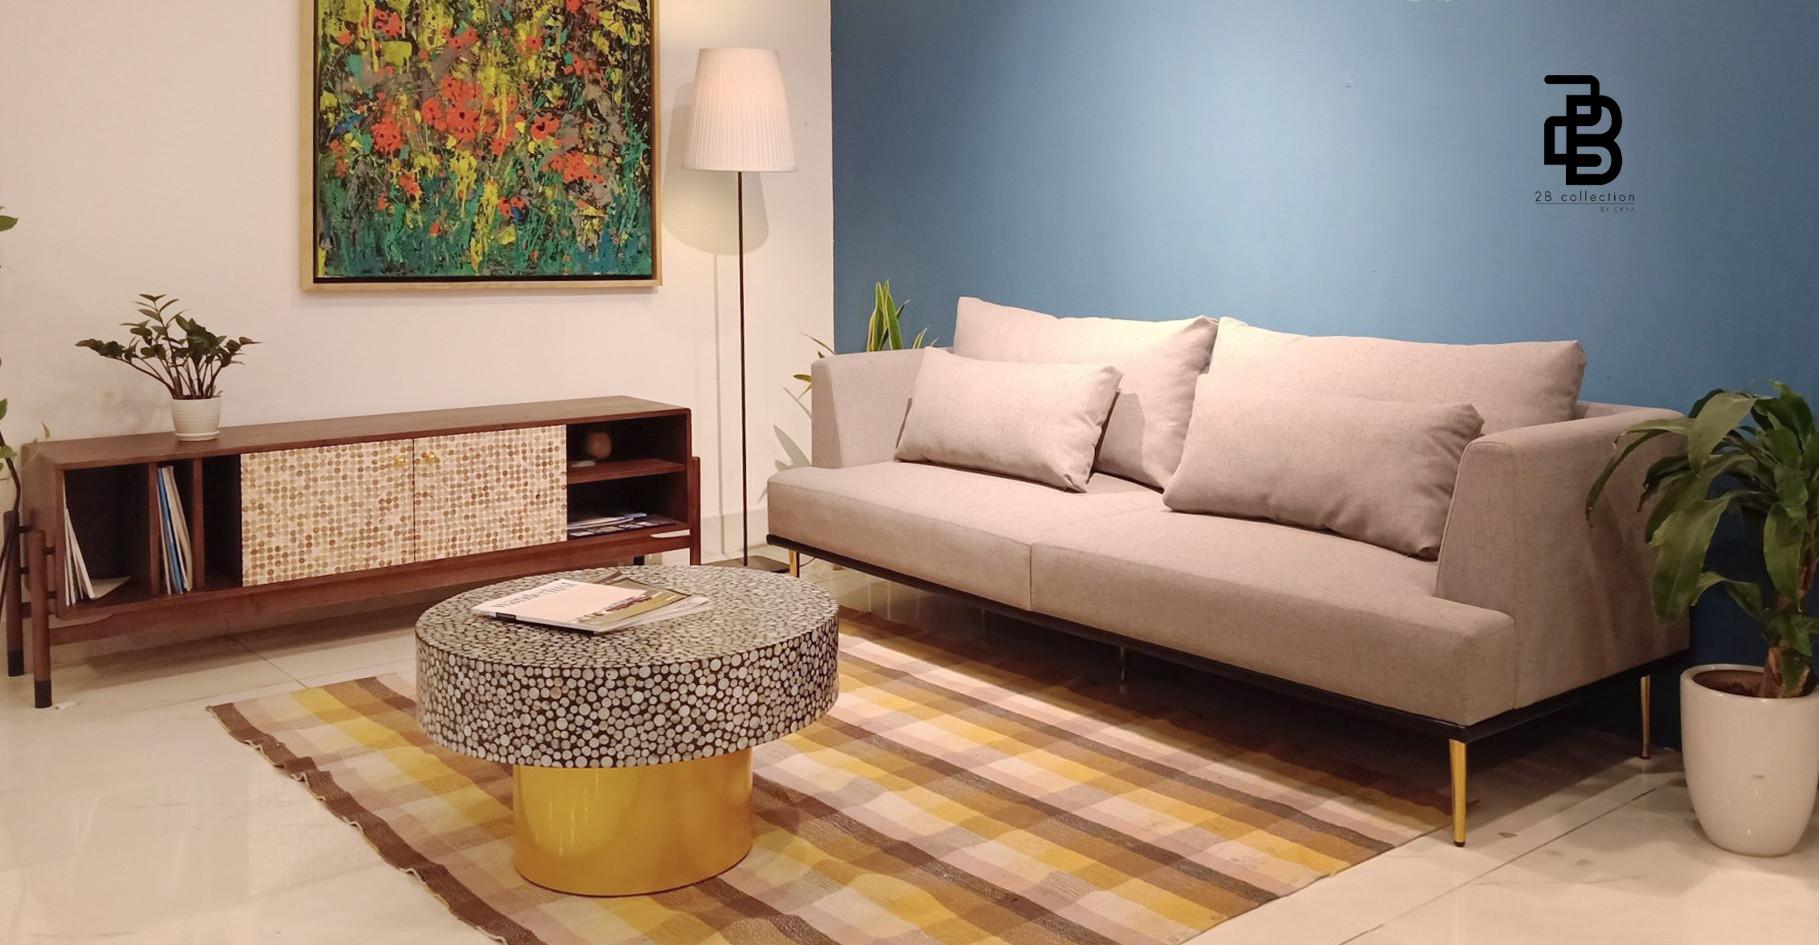 Warming living room